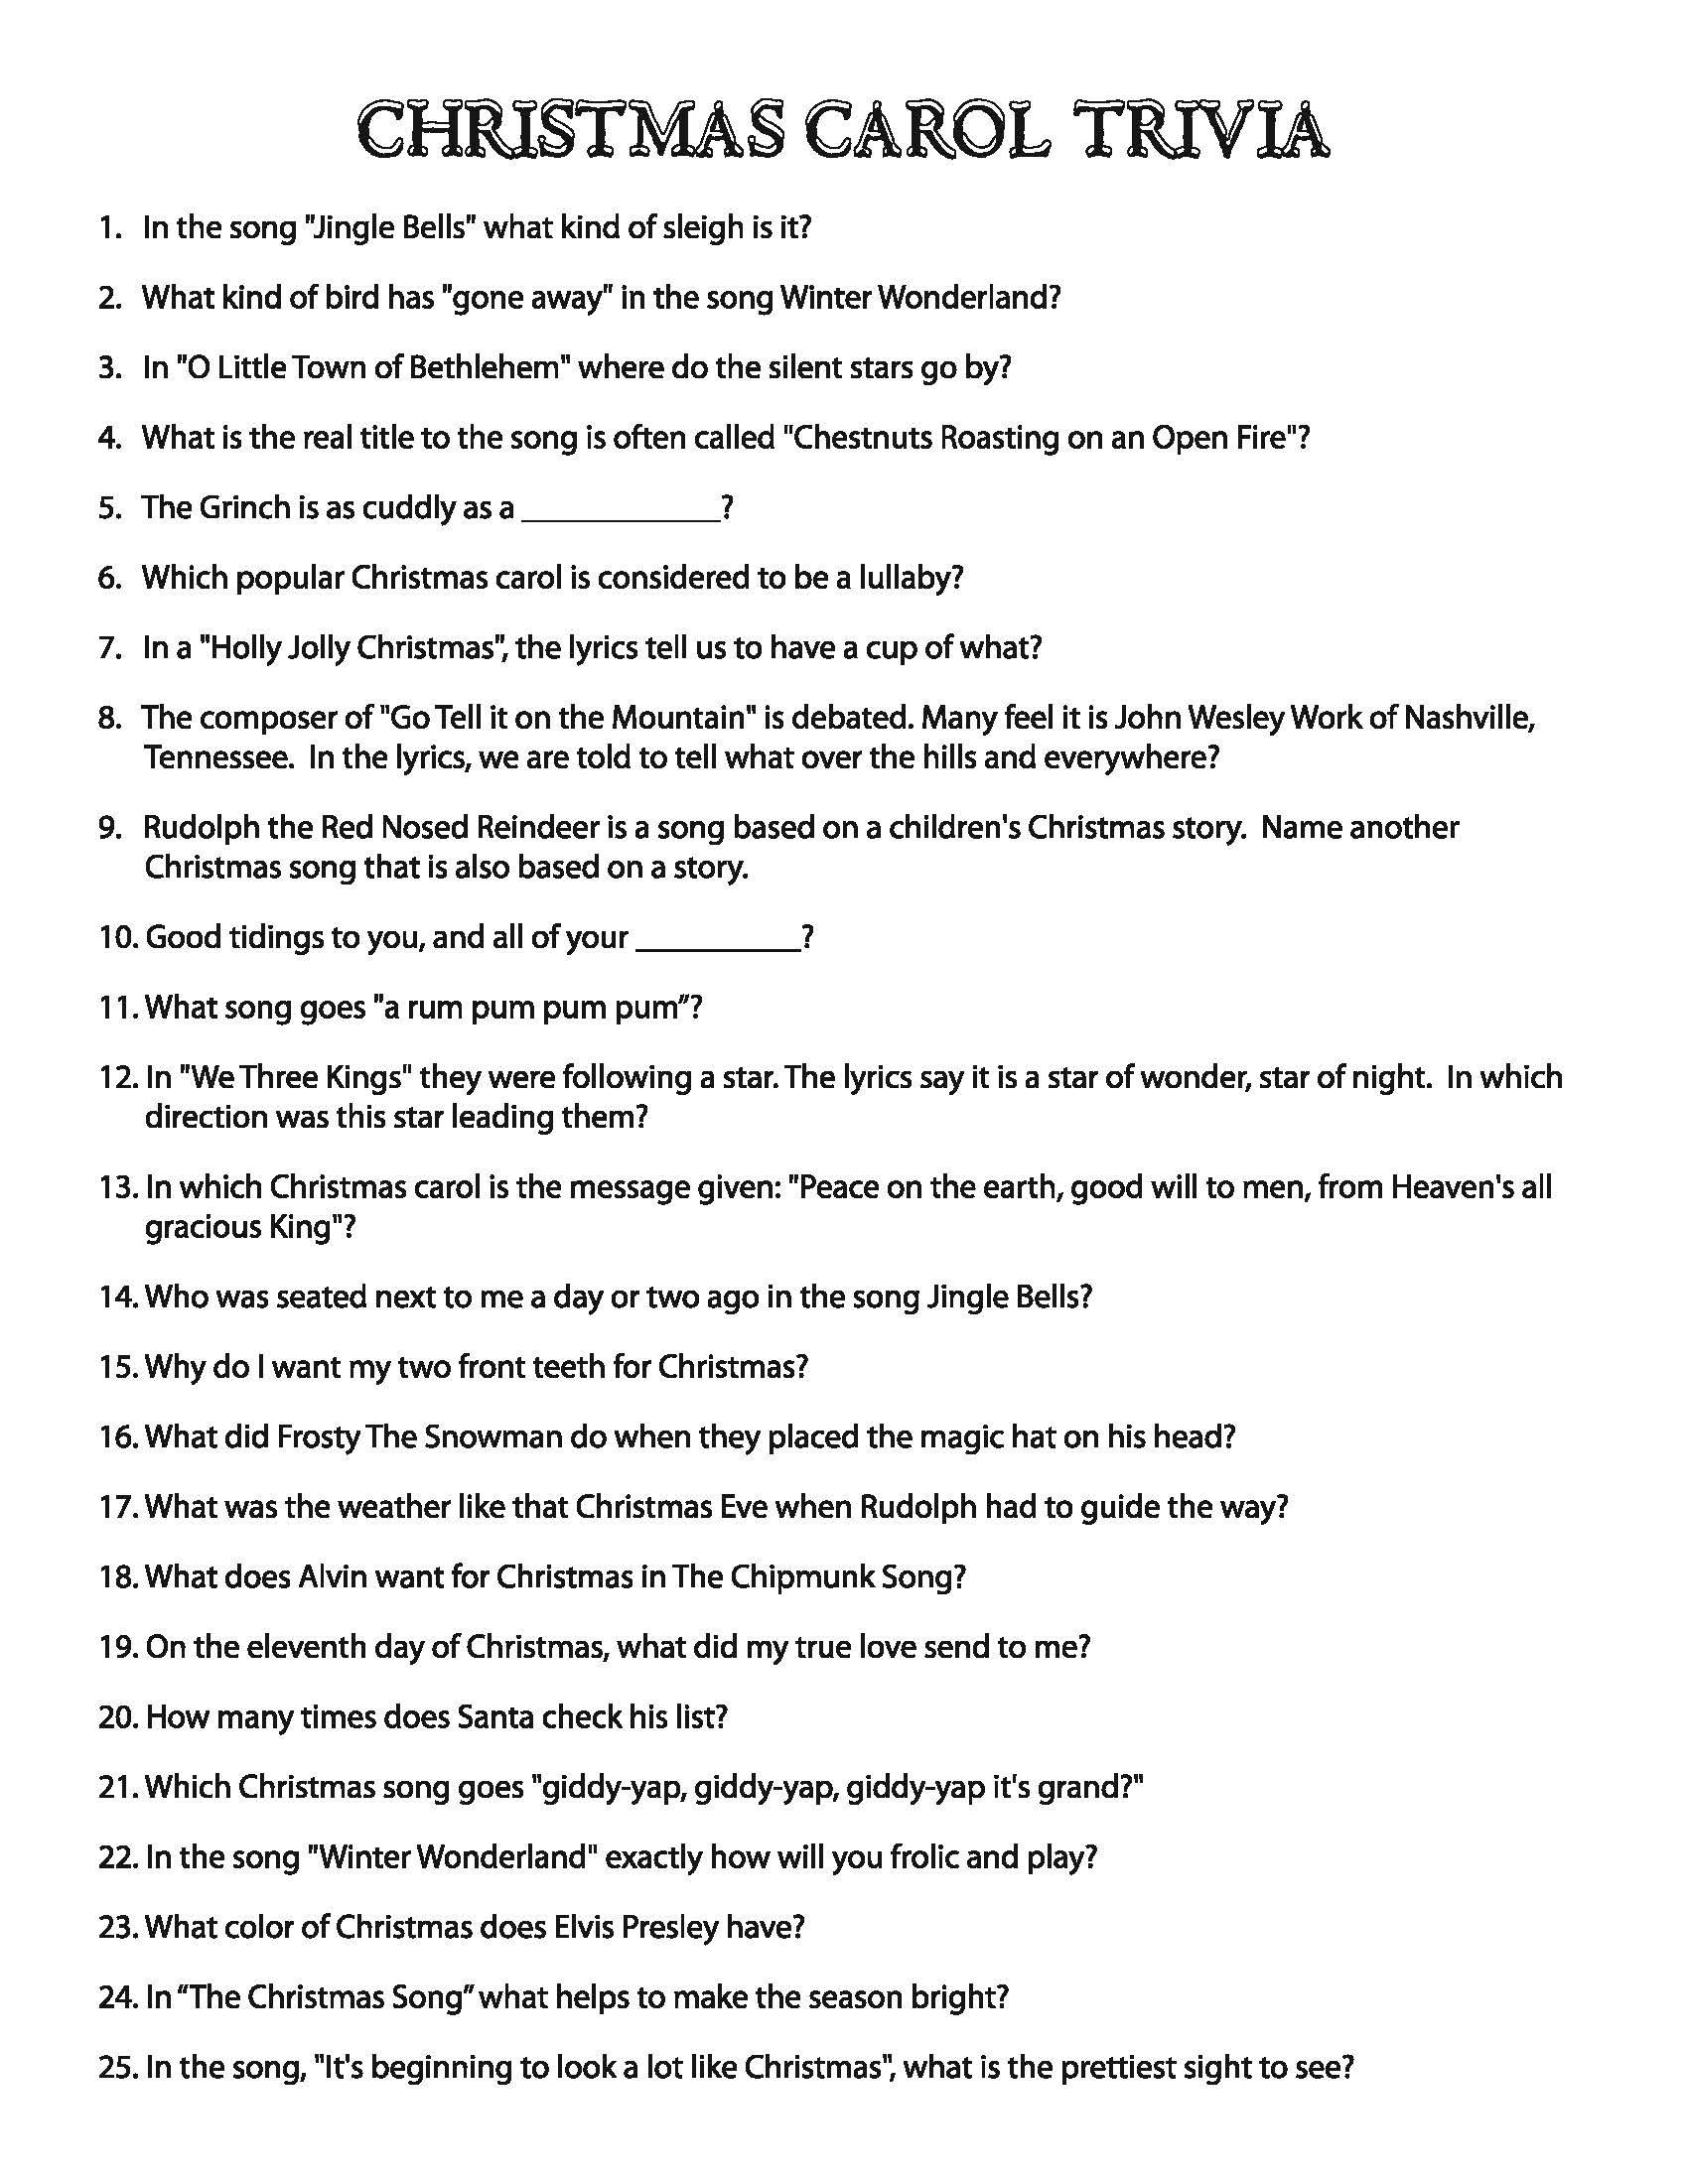 Free Printable Holiday Brain Teasers